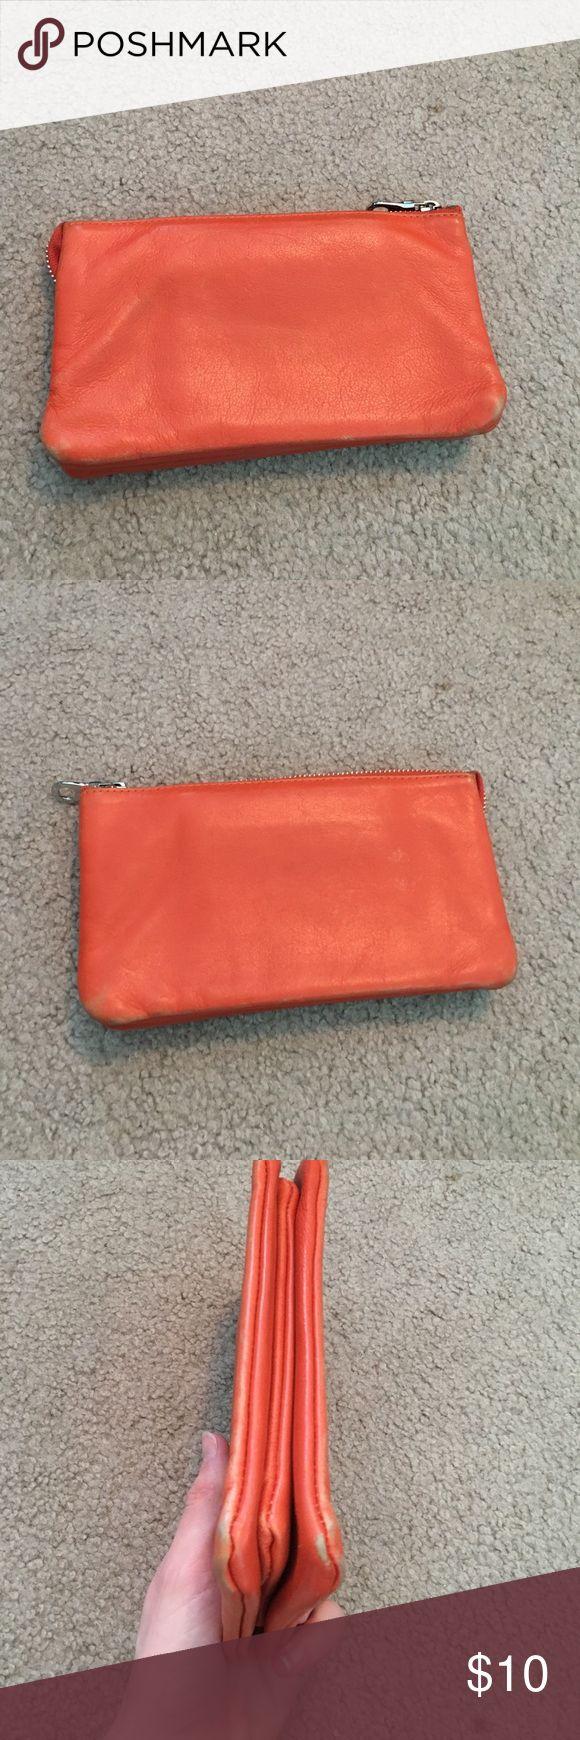 Orange Clutch Orange leather clutch Christopher.kon. Shows wear on leather exterior and canvas interior as pictures. christopher.kon Bags Clutches & Wristlets